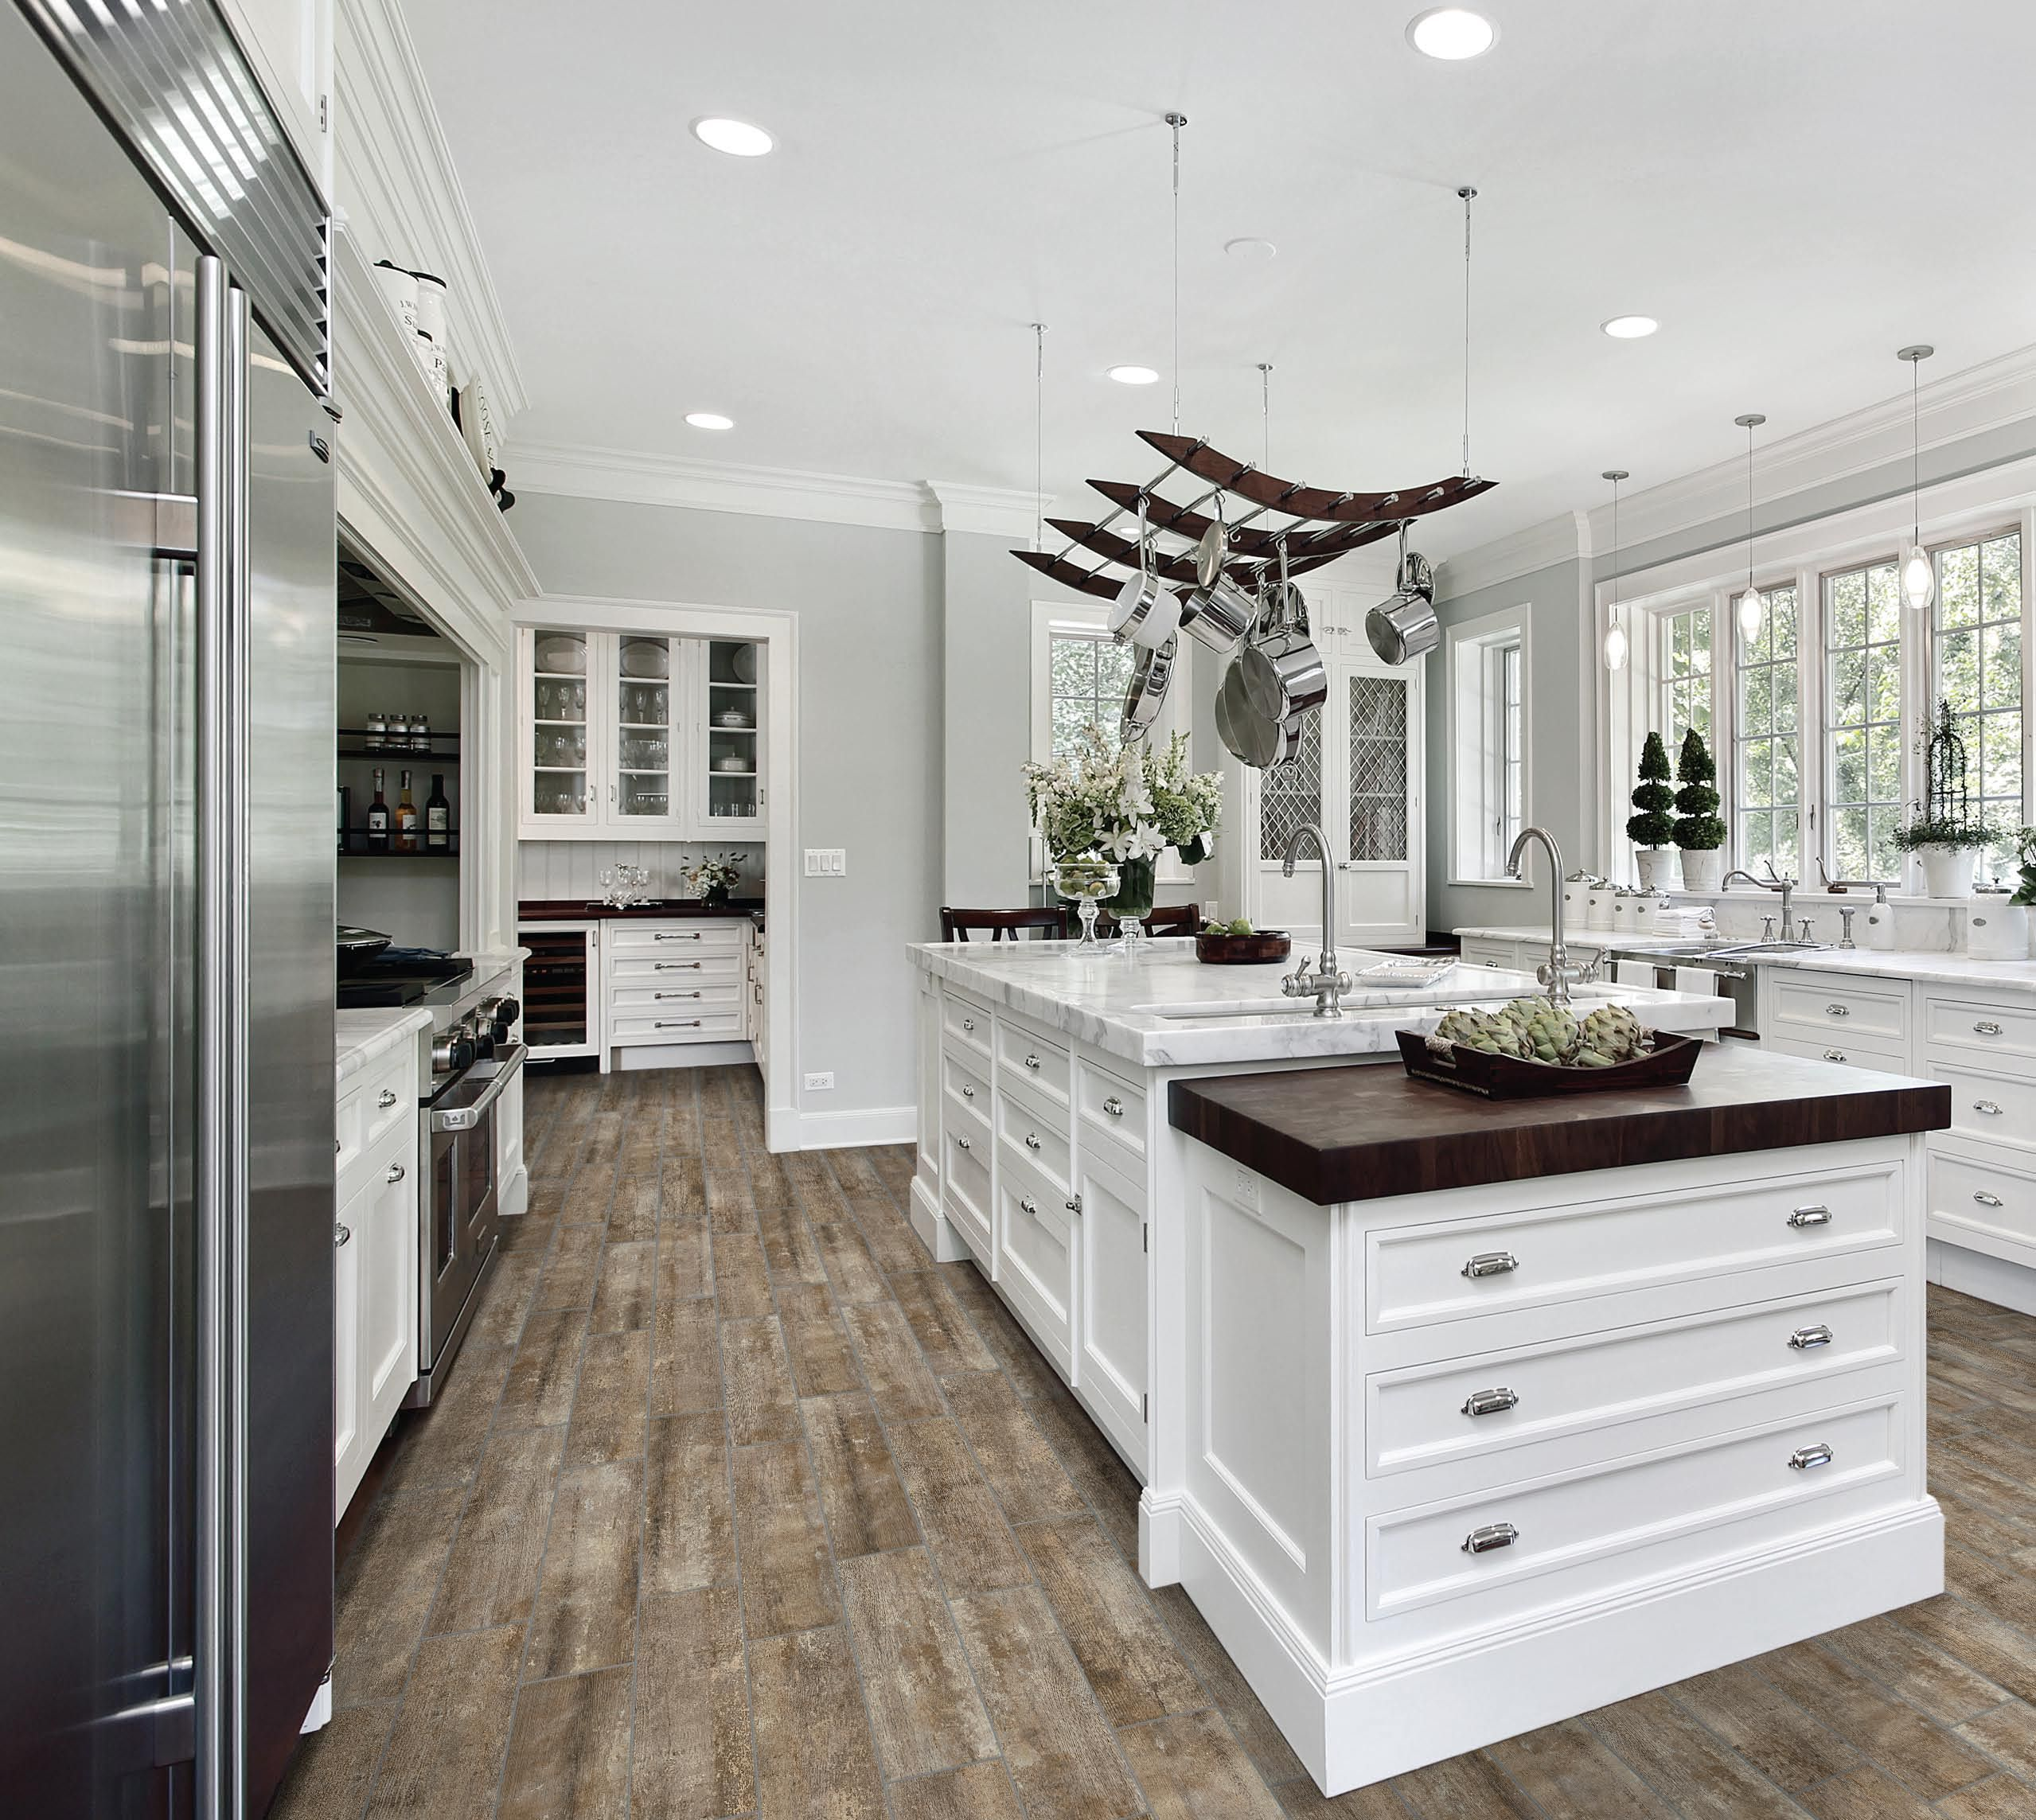 Anatolia // Modern Farmhouse Kitchen // What a beautiful